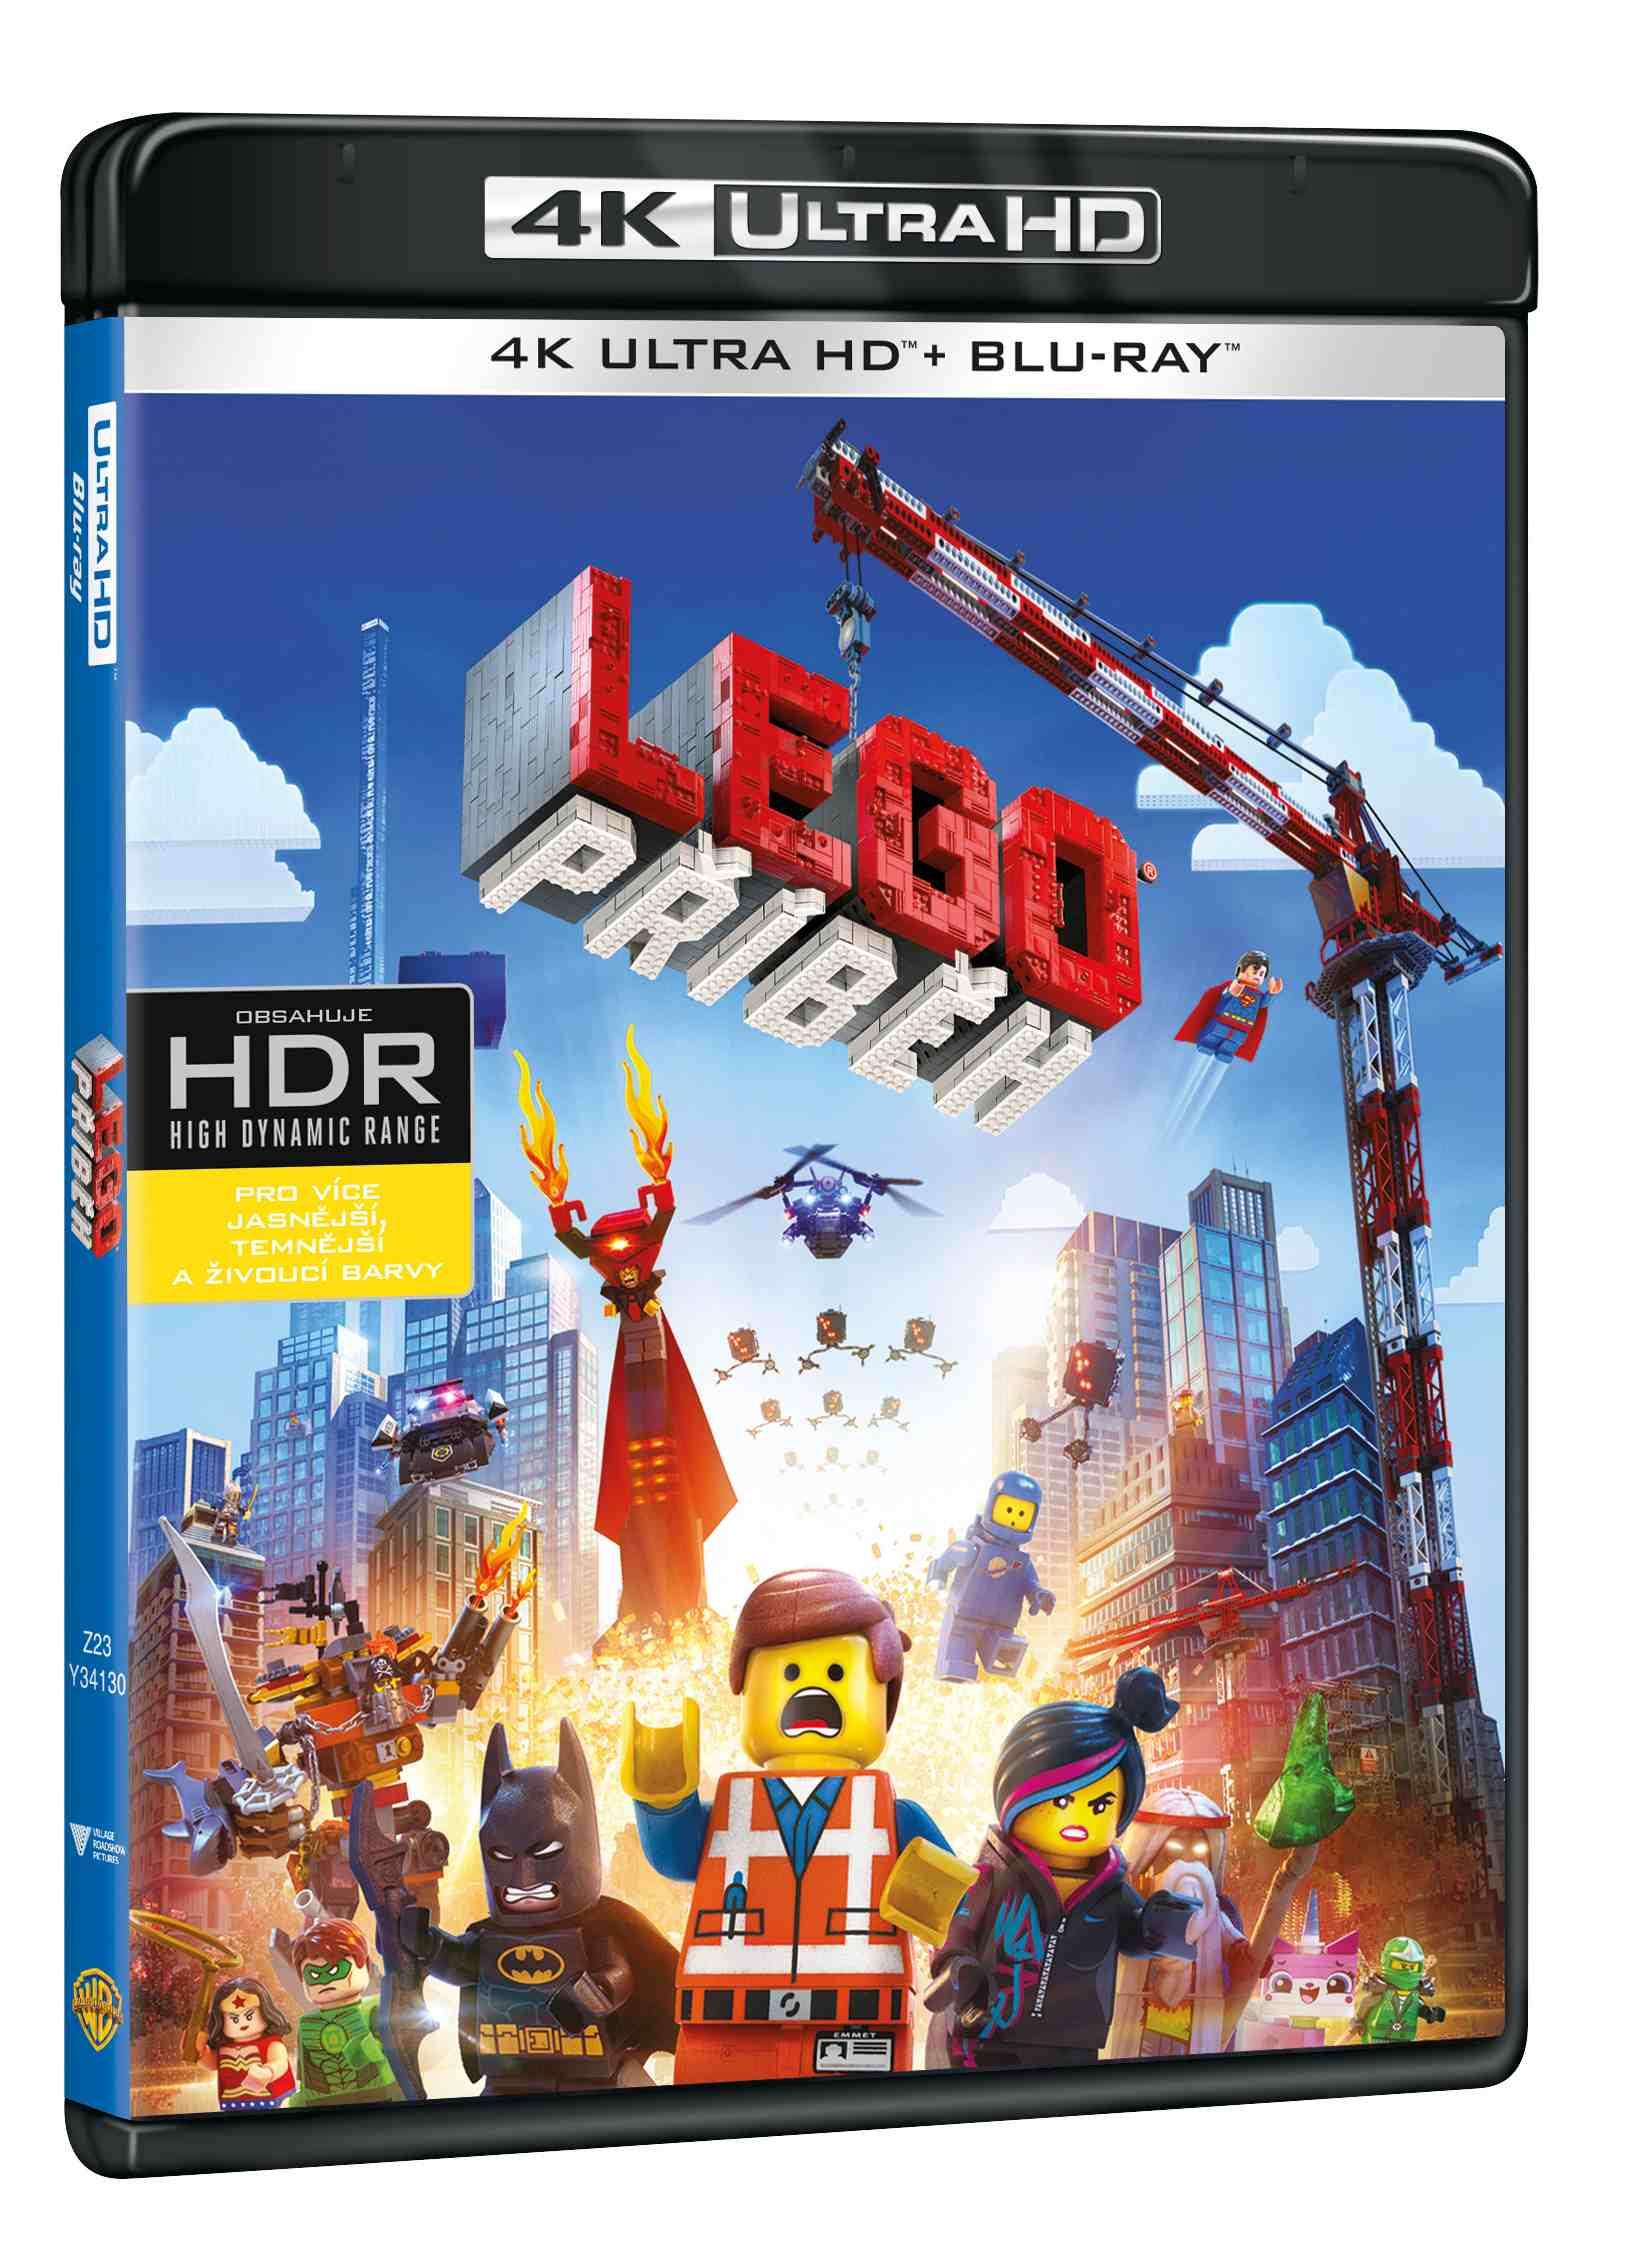 LEGO PŘÍBĚH (4K ULTRA HD) - UHD Blu-ray + Blu-ray (2 BD)